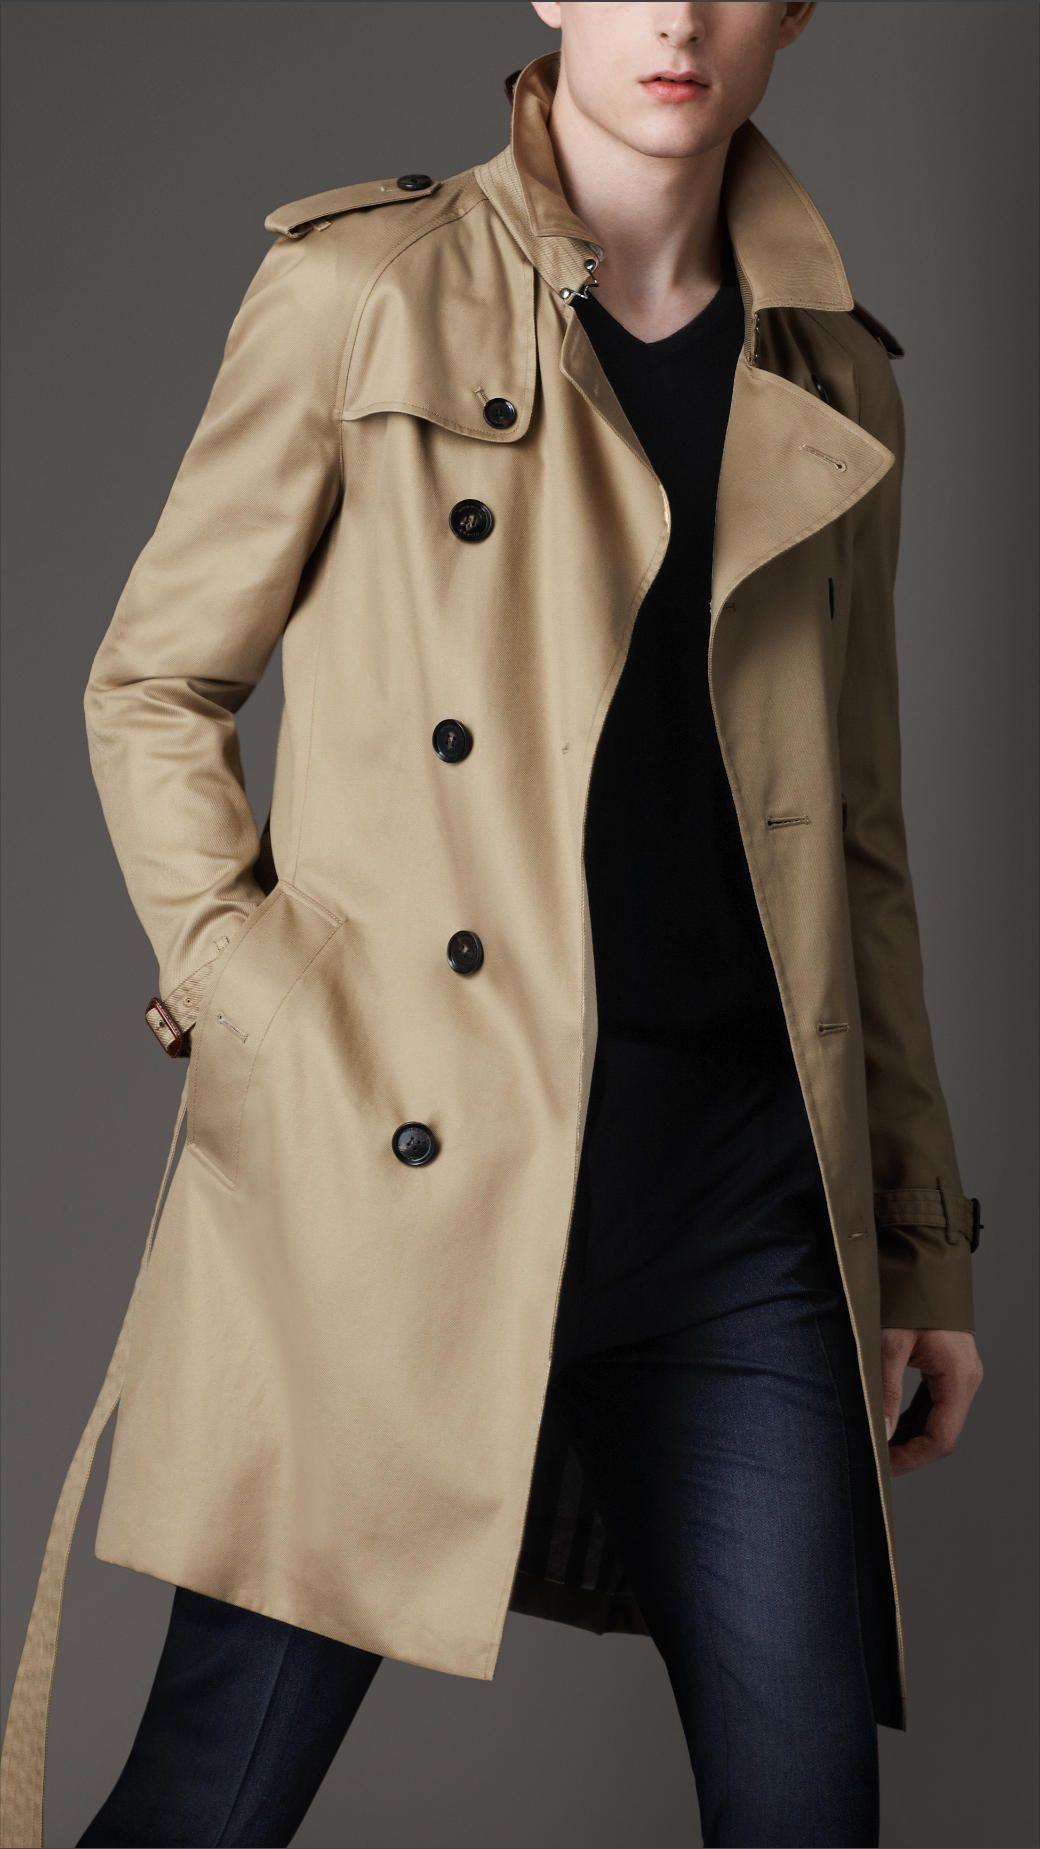 beige raincoat mens - Google Search   6'3